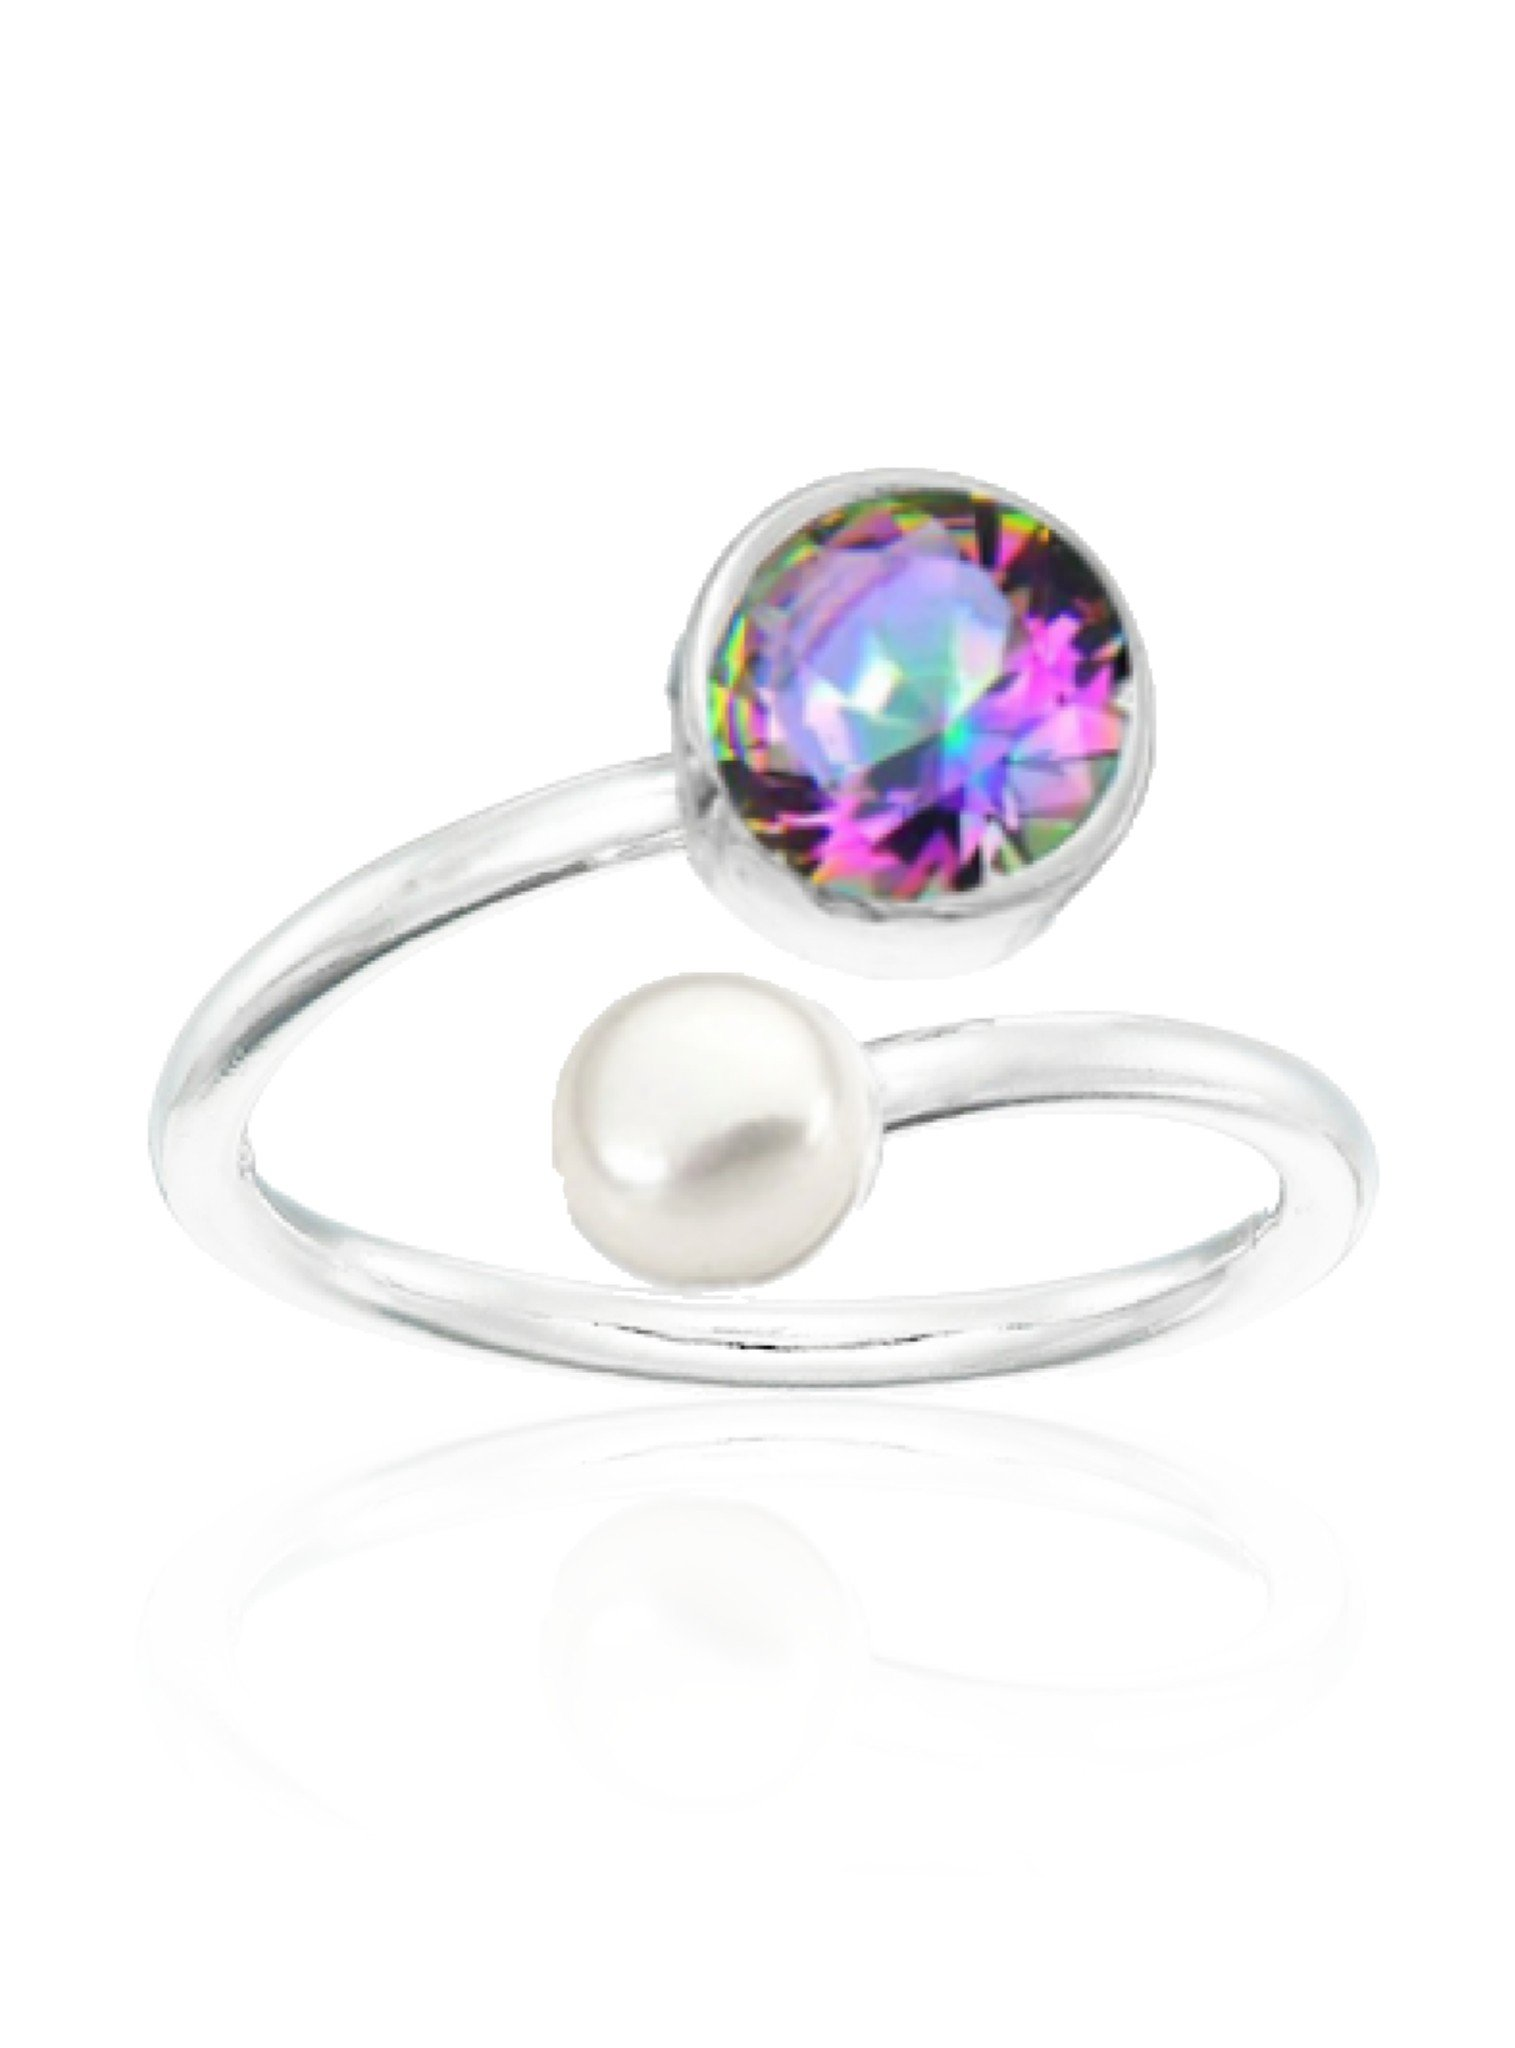 Clarke Mystic Pearl Ring in Silver